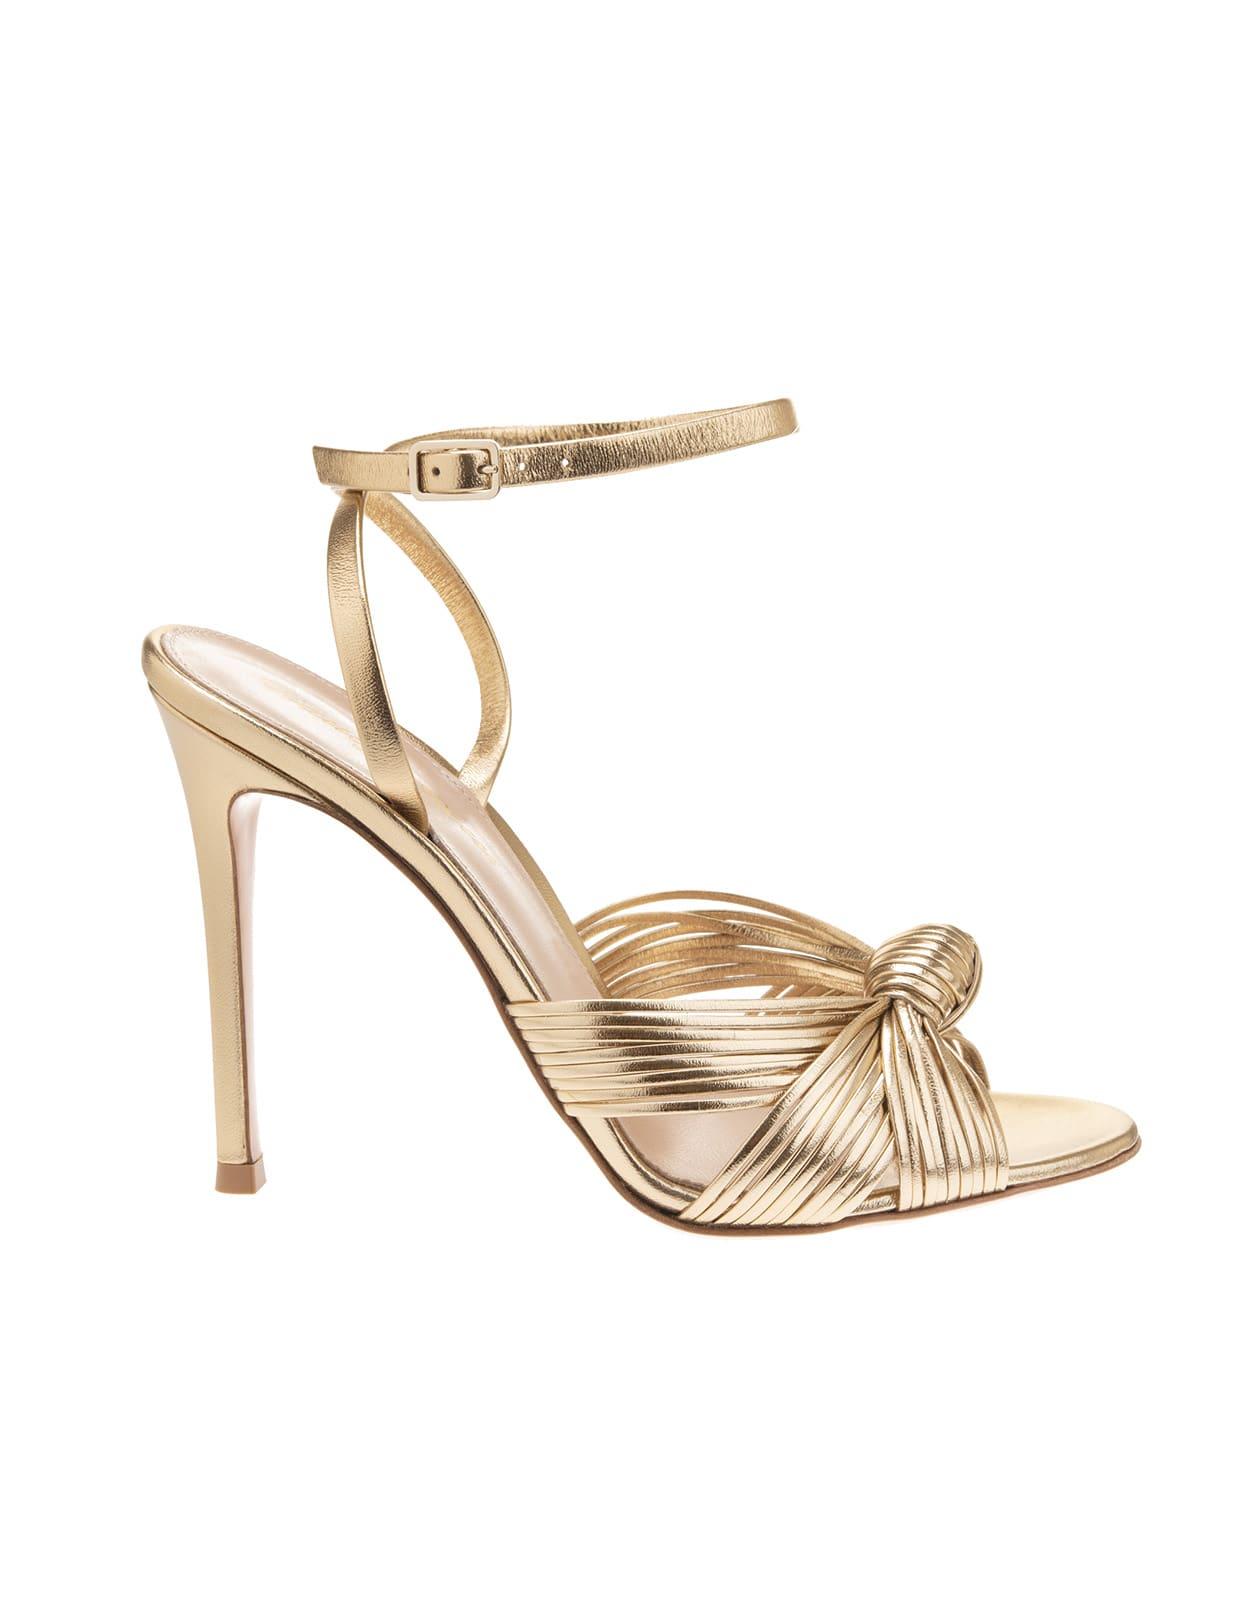 Knot Detail Sandals